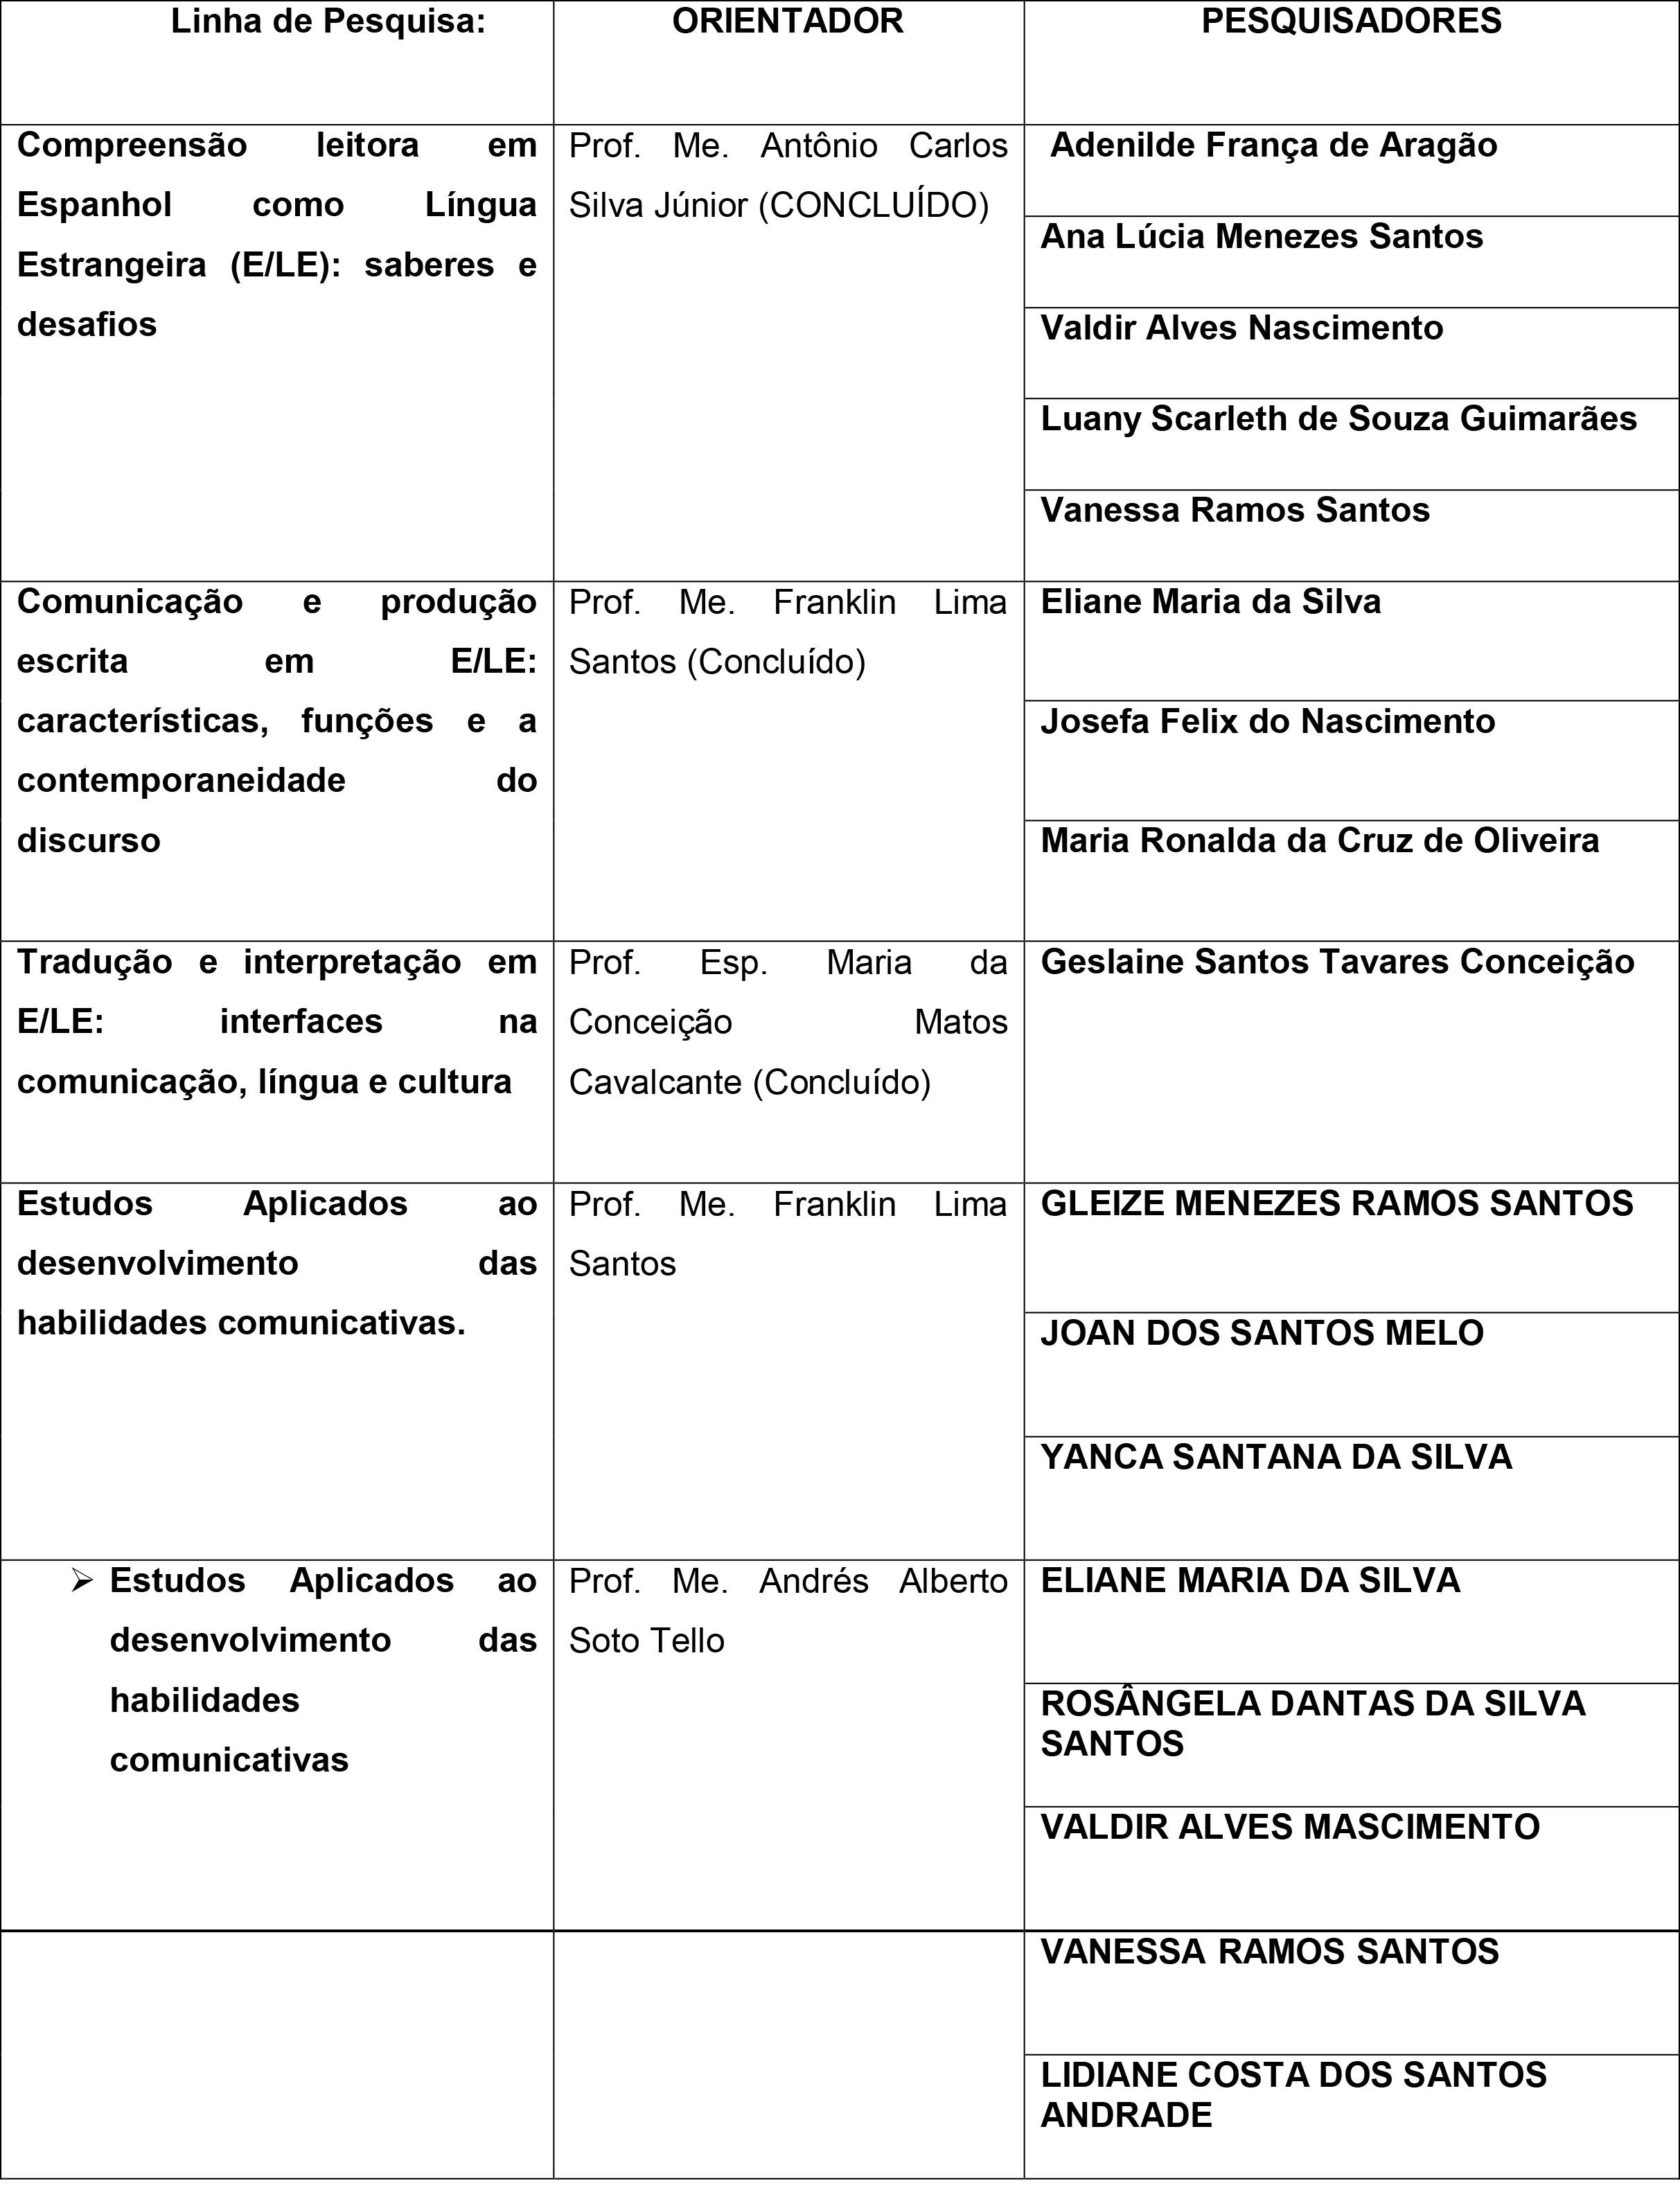 tabela07.jpg